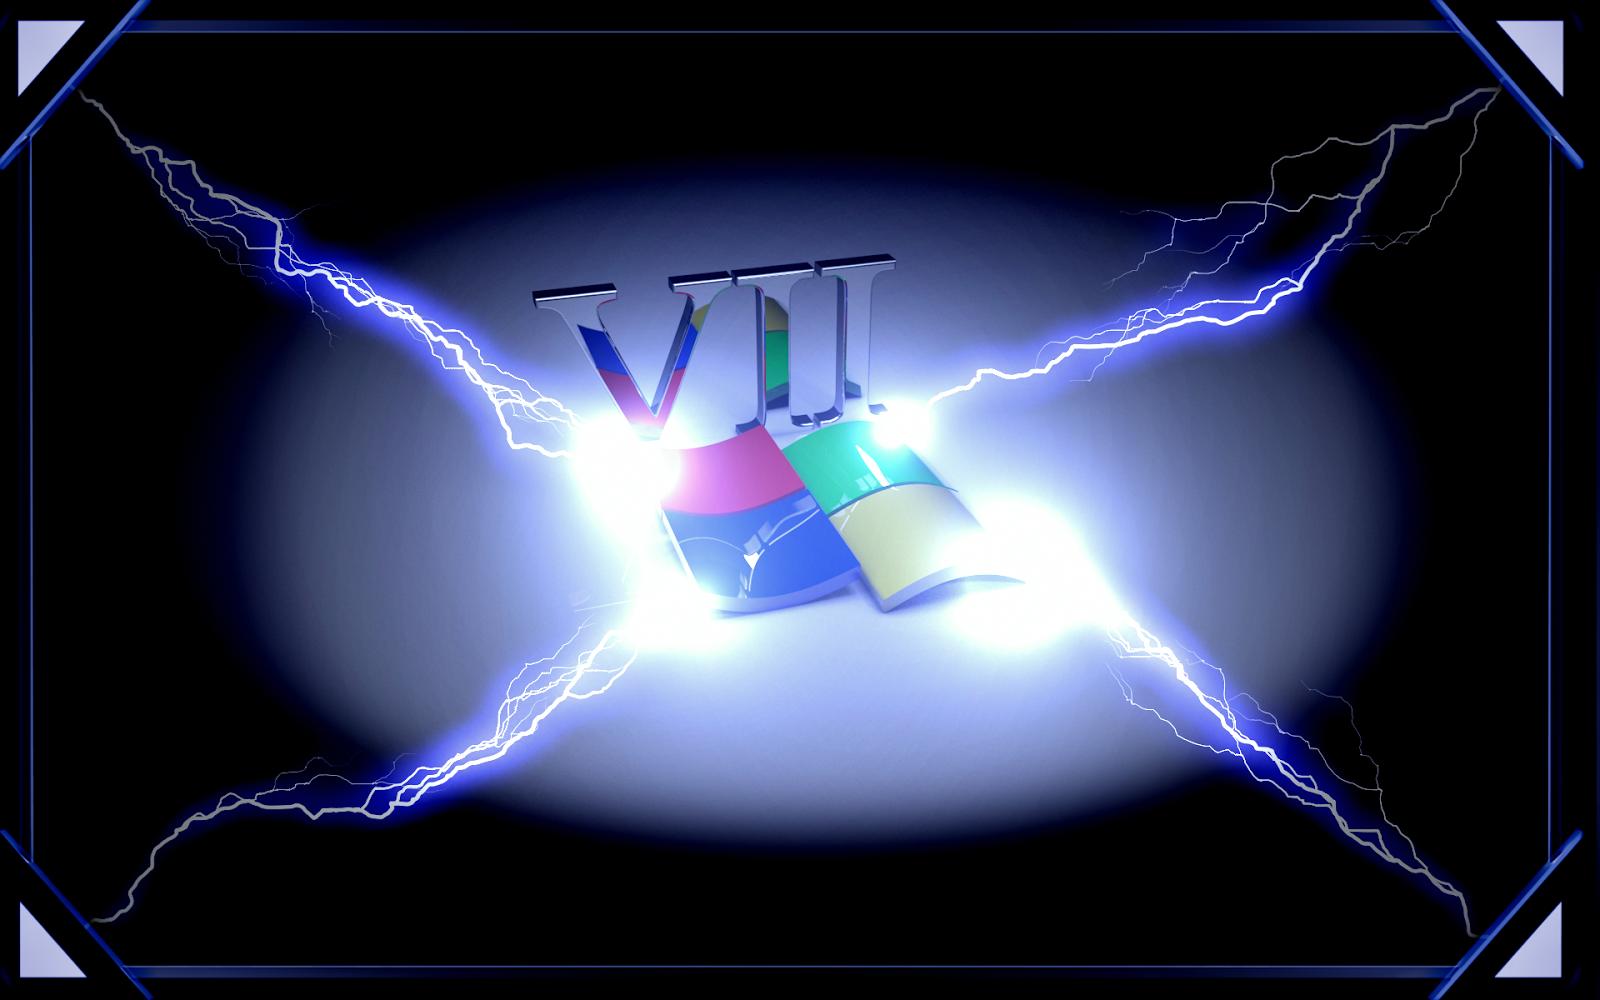 Desktop Hd Wallpapers 3d Windows Logos